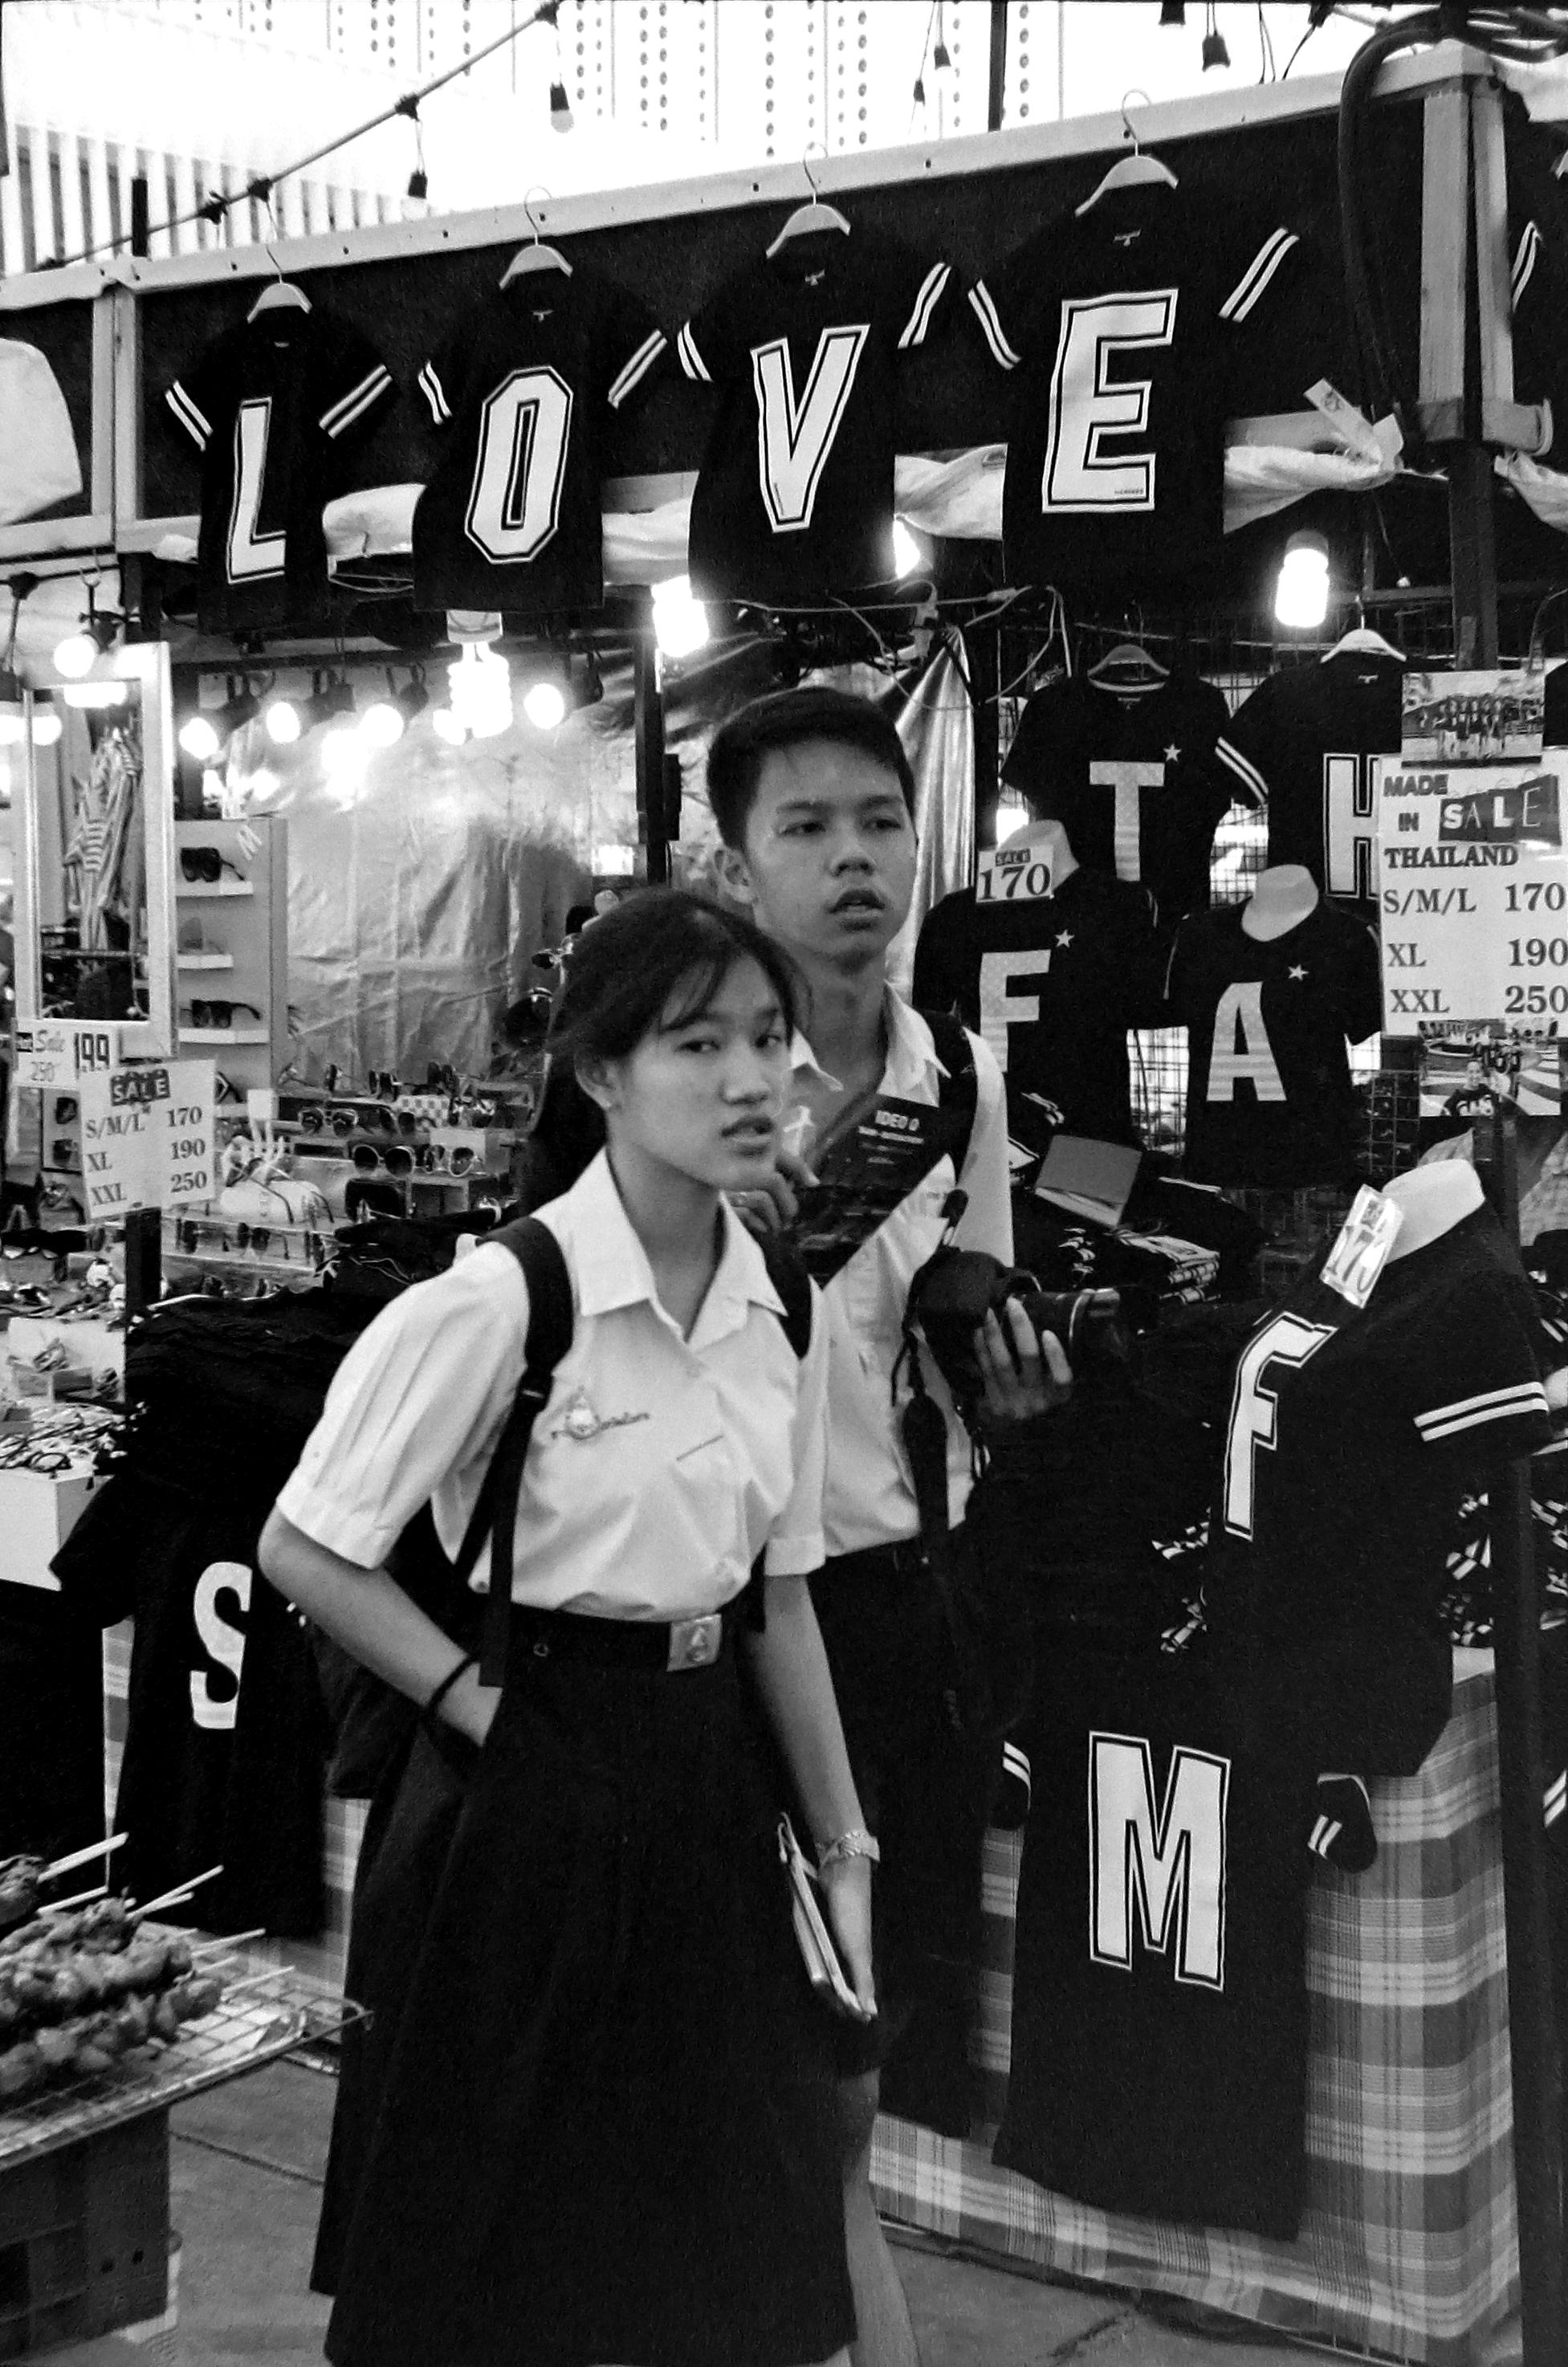 chromacomaphoto street photography bangkok thailand film tri x summicron rigid 50 leica m4 black and white (6).JPG